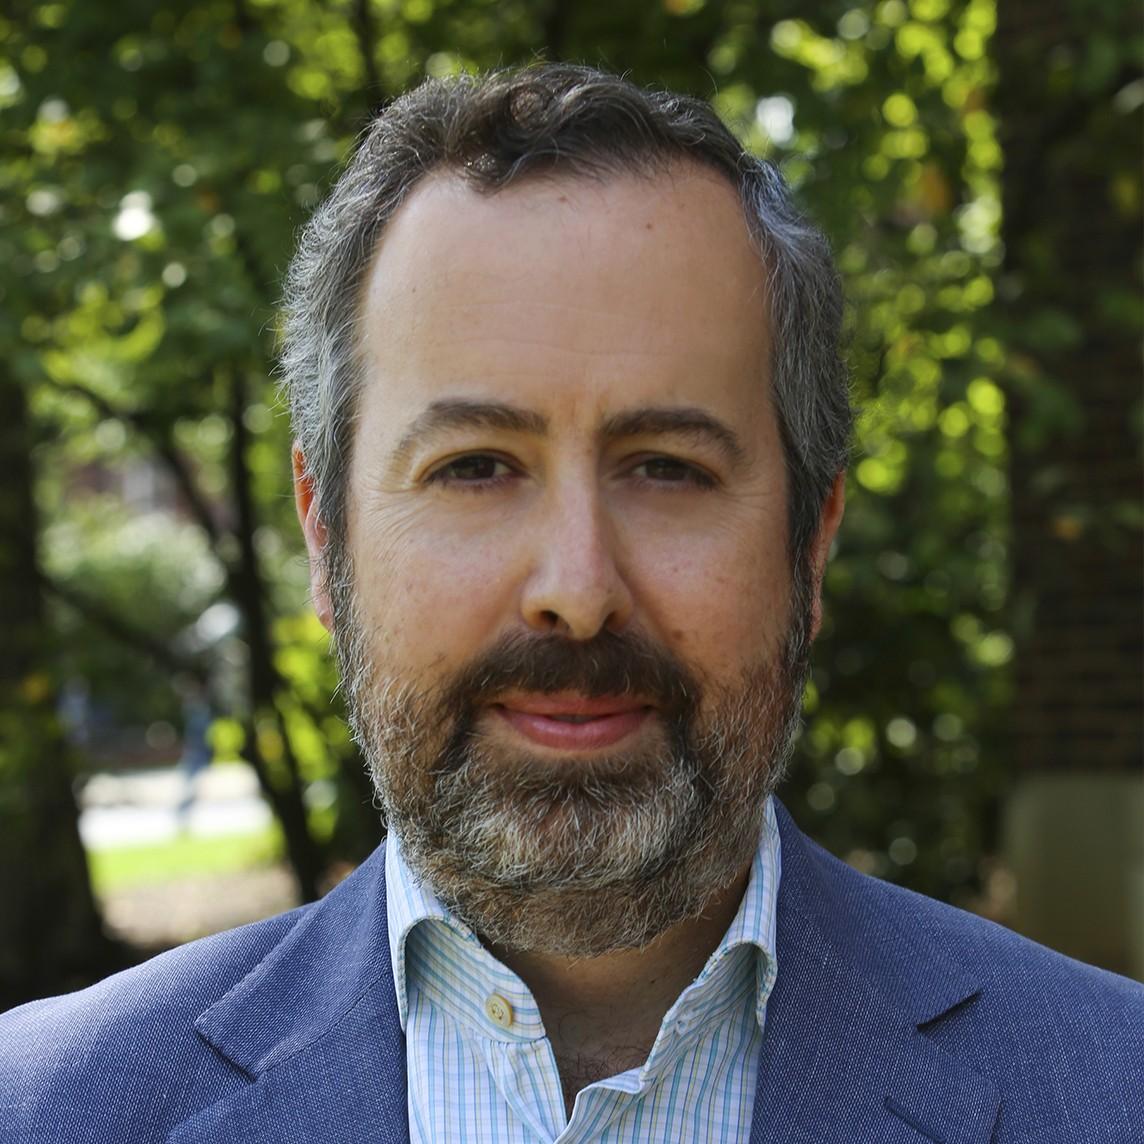 Headshot of Professor Robin Thomas wearing plan shirt and blue jacket